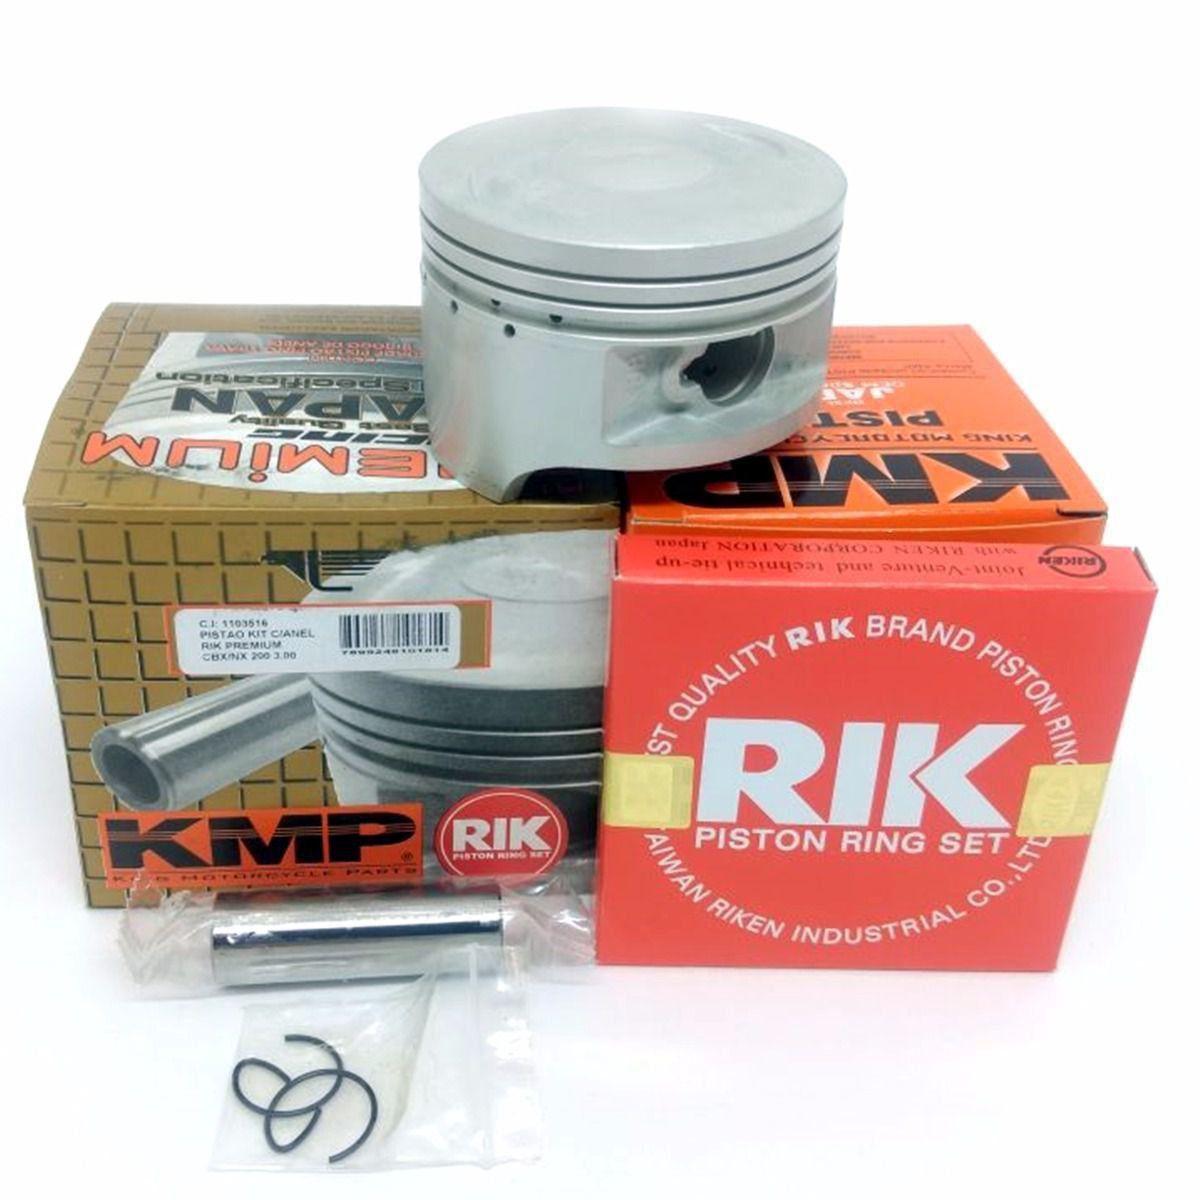 Kit Pistão Kmp Premium Anéis Rik Xr 200 Cbx 200 Nx 200 Std Á 2.00mm